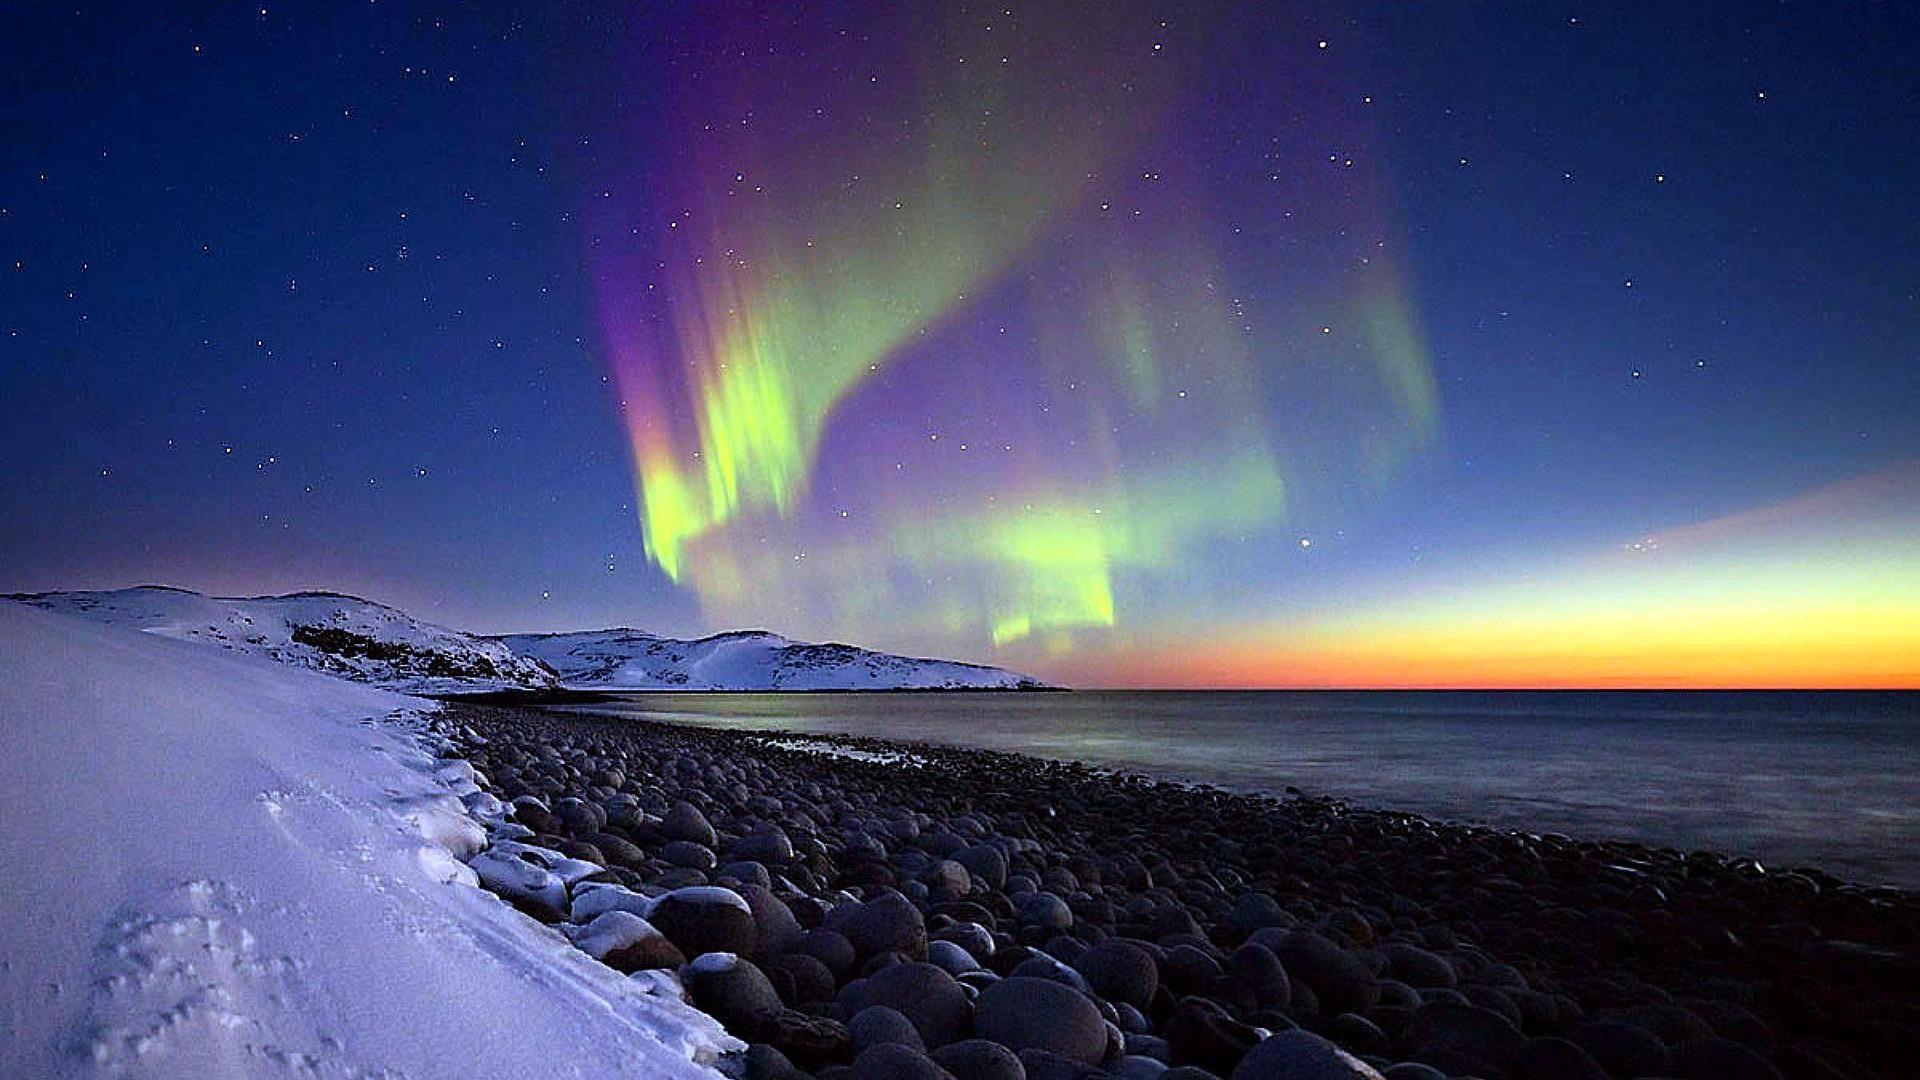 Aurora Borealis 5 HD Screensavers